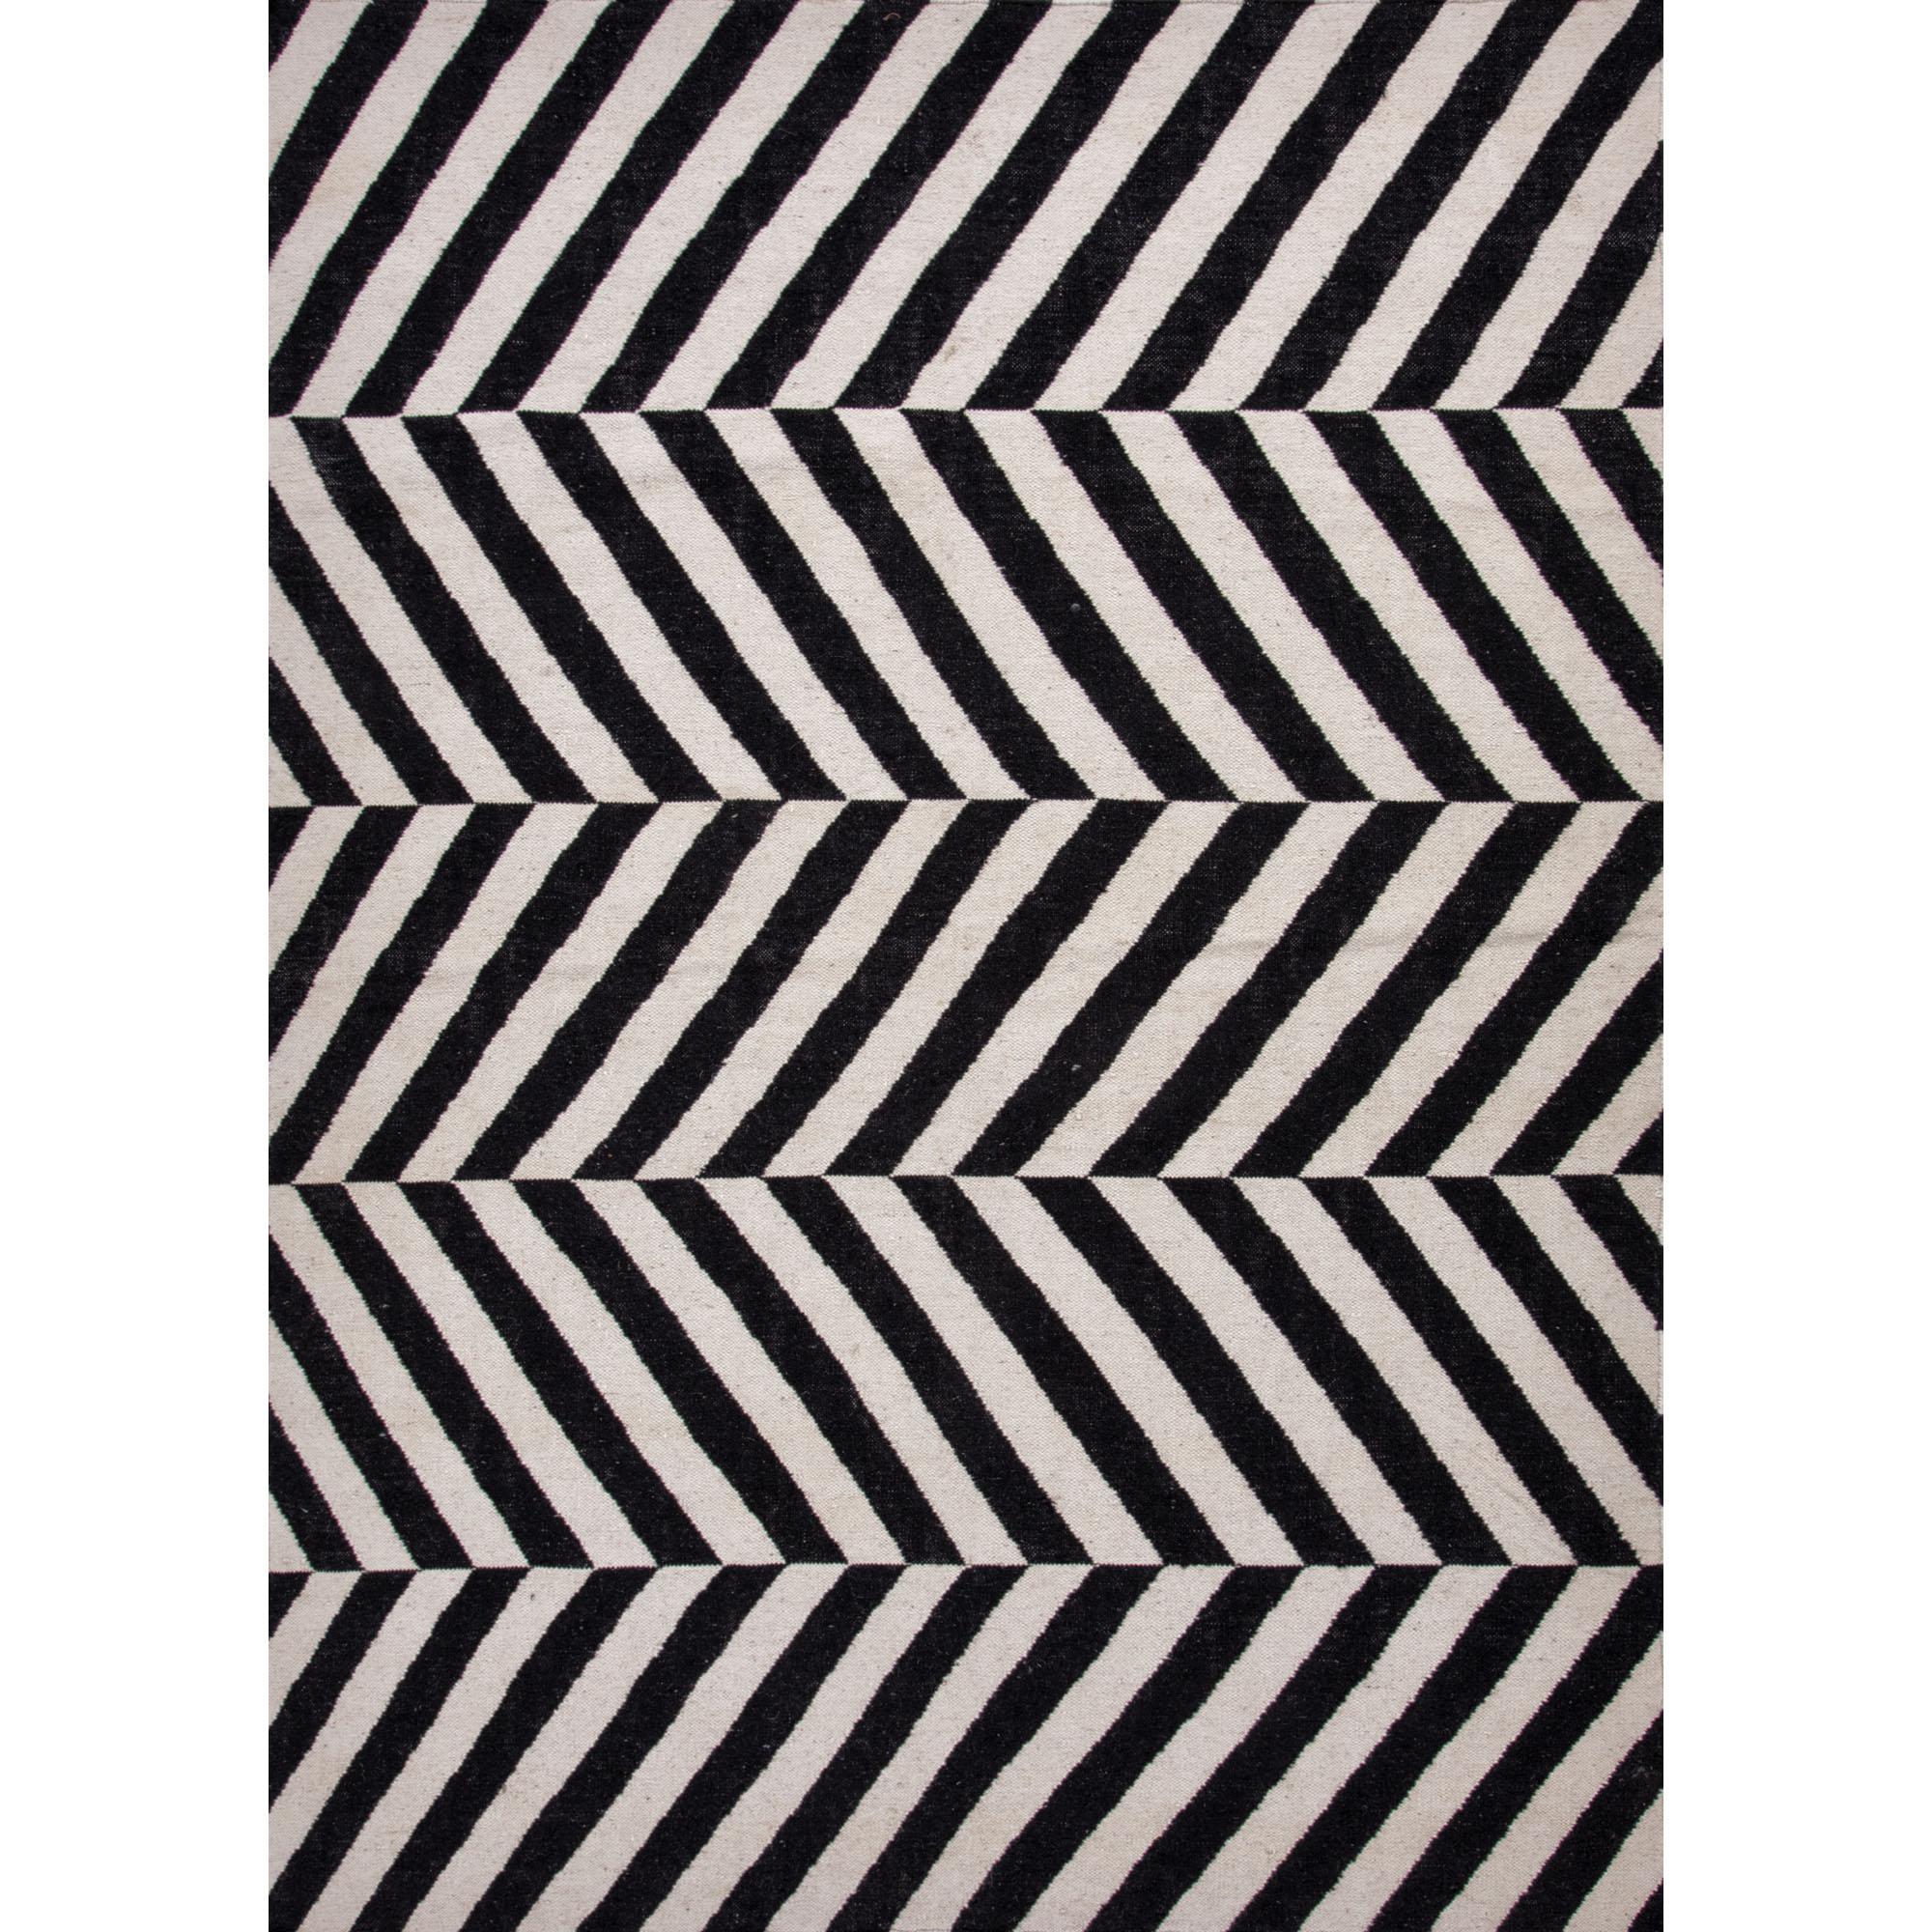 JAIPUR Rugs Maroc 3.6 x 5.6 Rug - Item Number: RUG102823